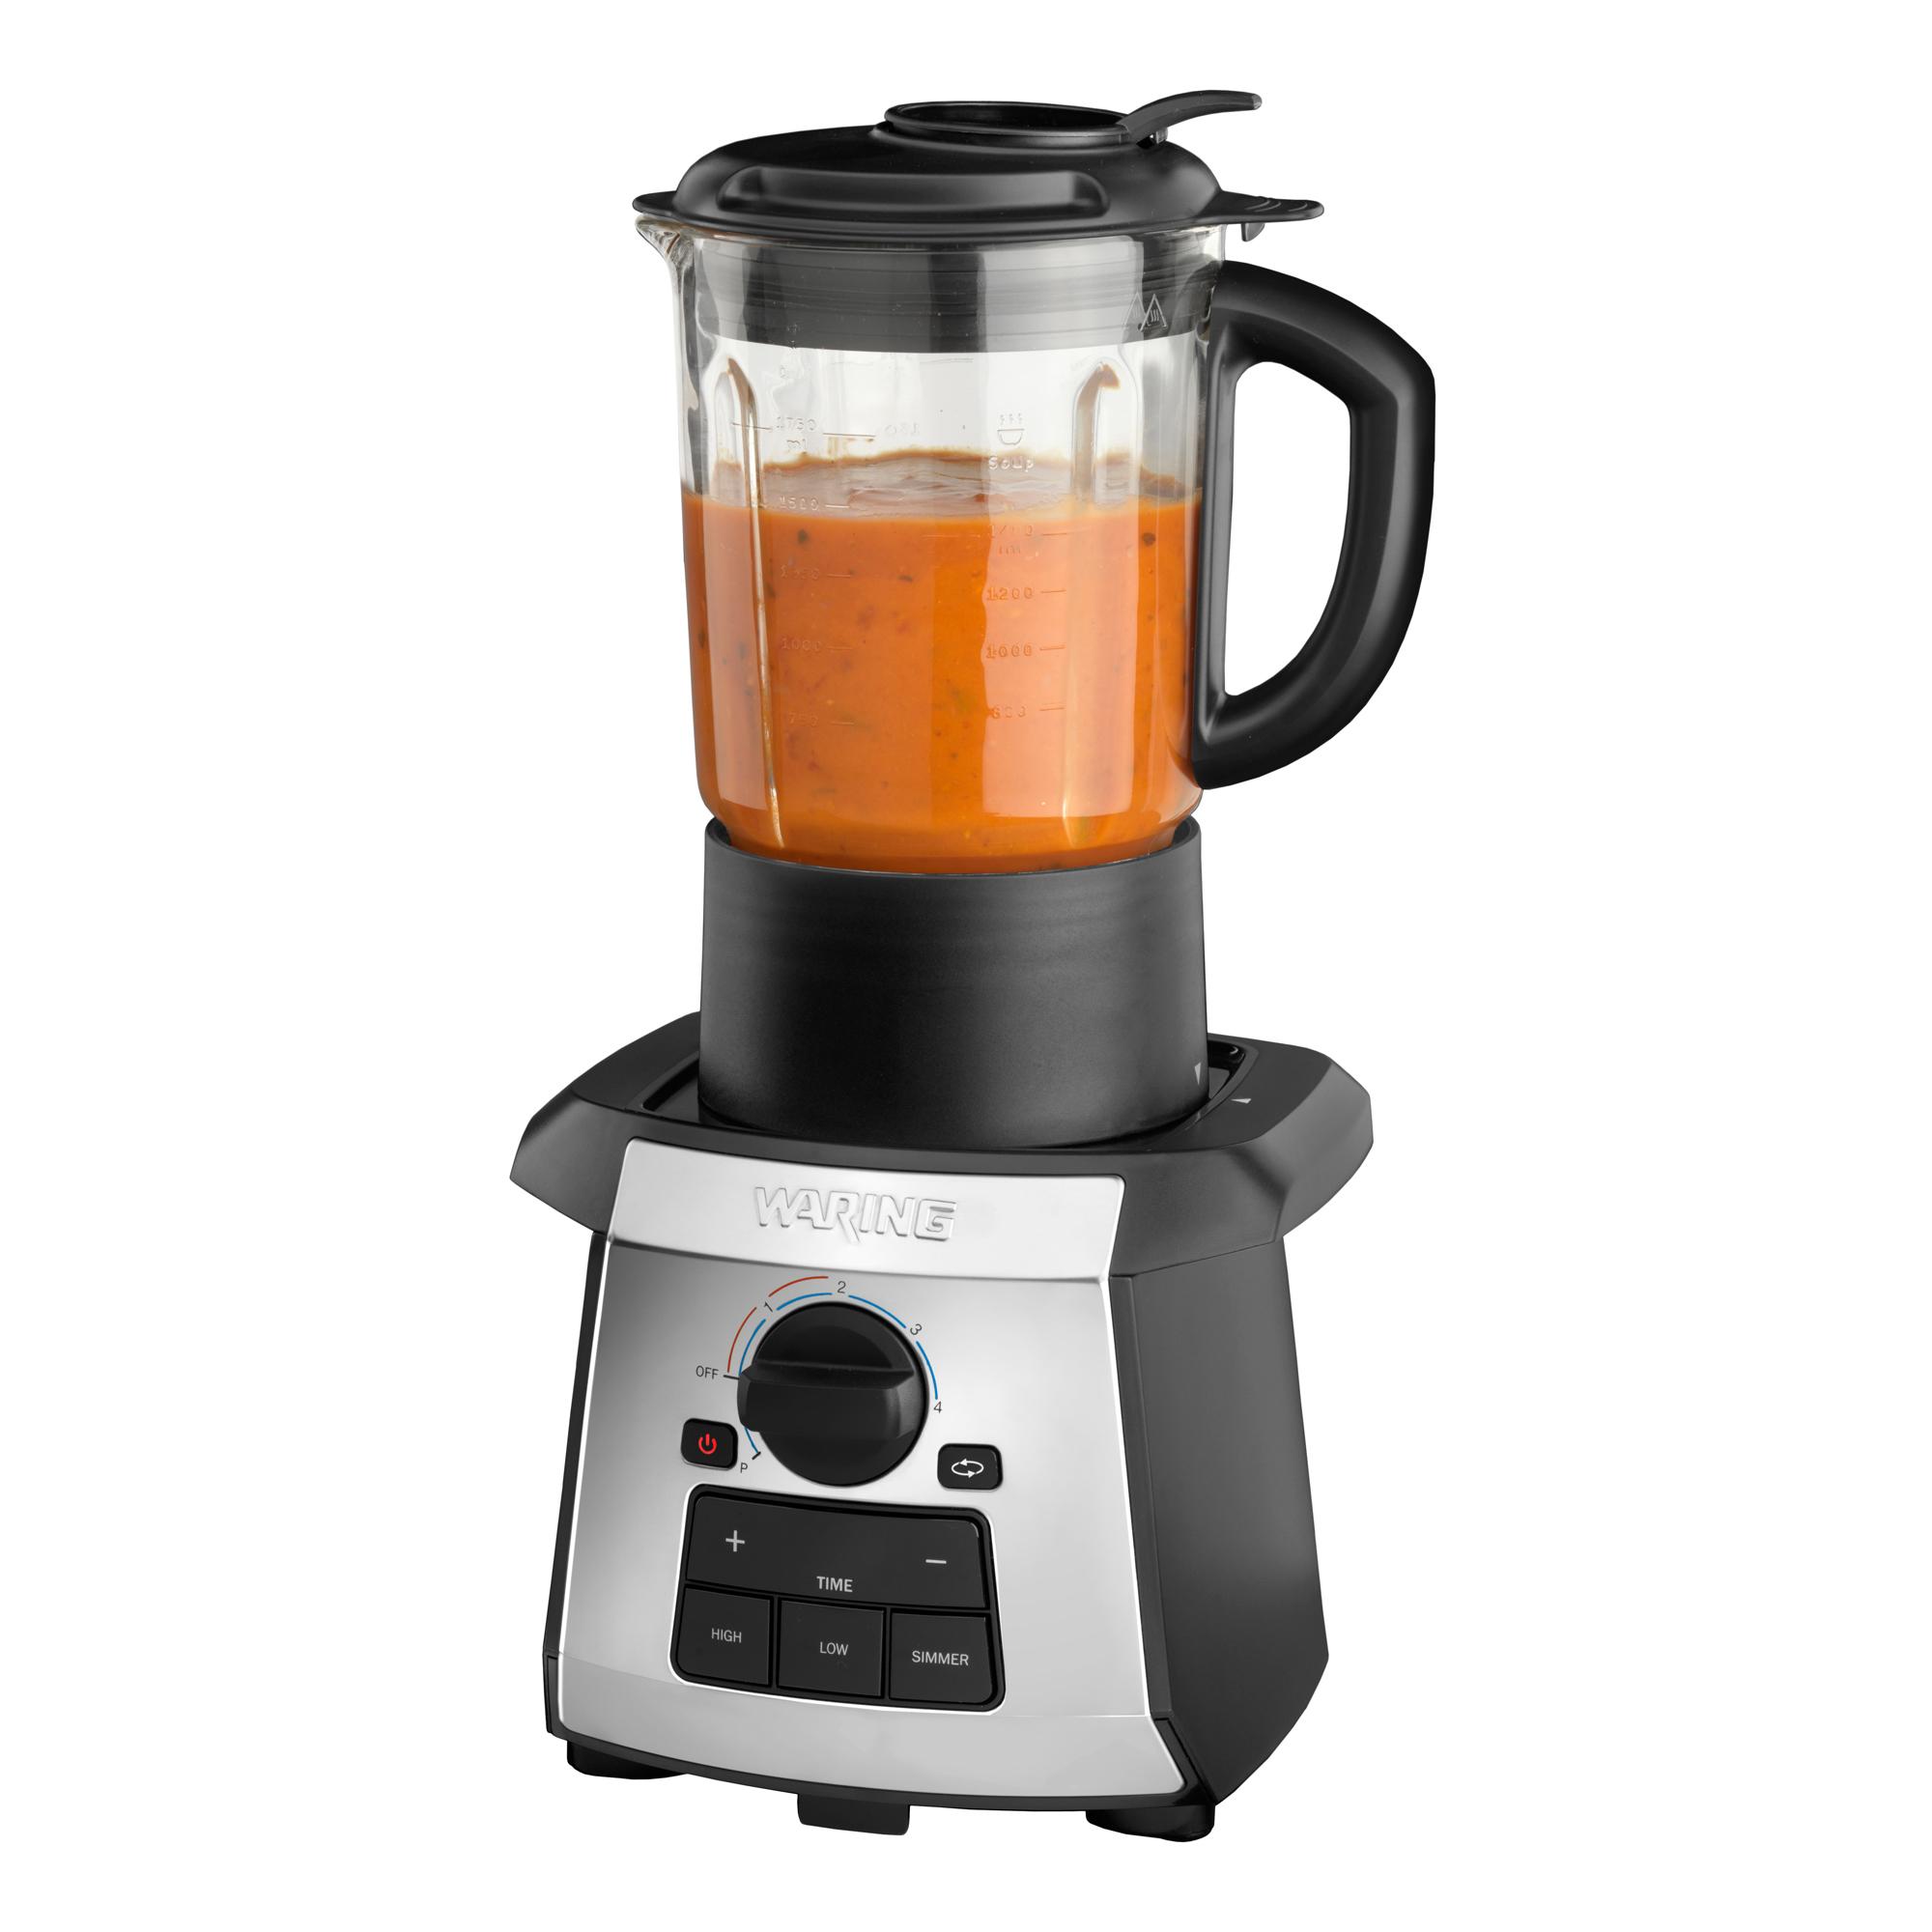 Waring Wsm1u All In One Non Stick Soup Maker Blender Cooker 1 75 Litre 1000 W